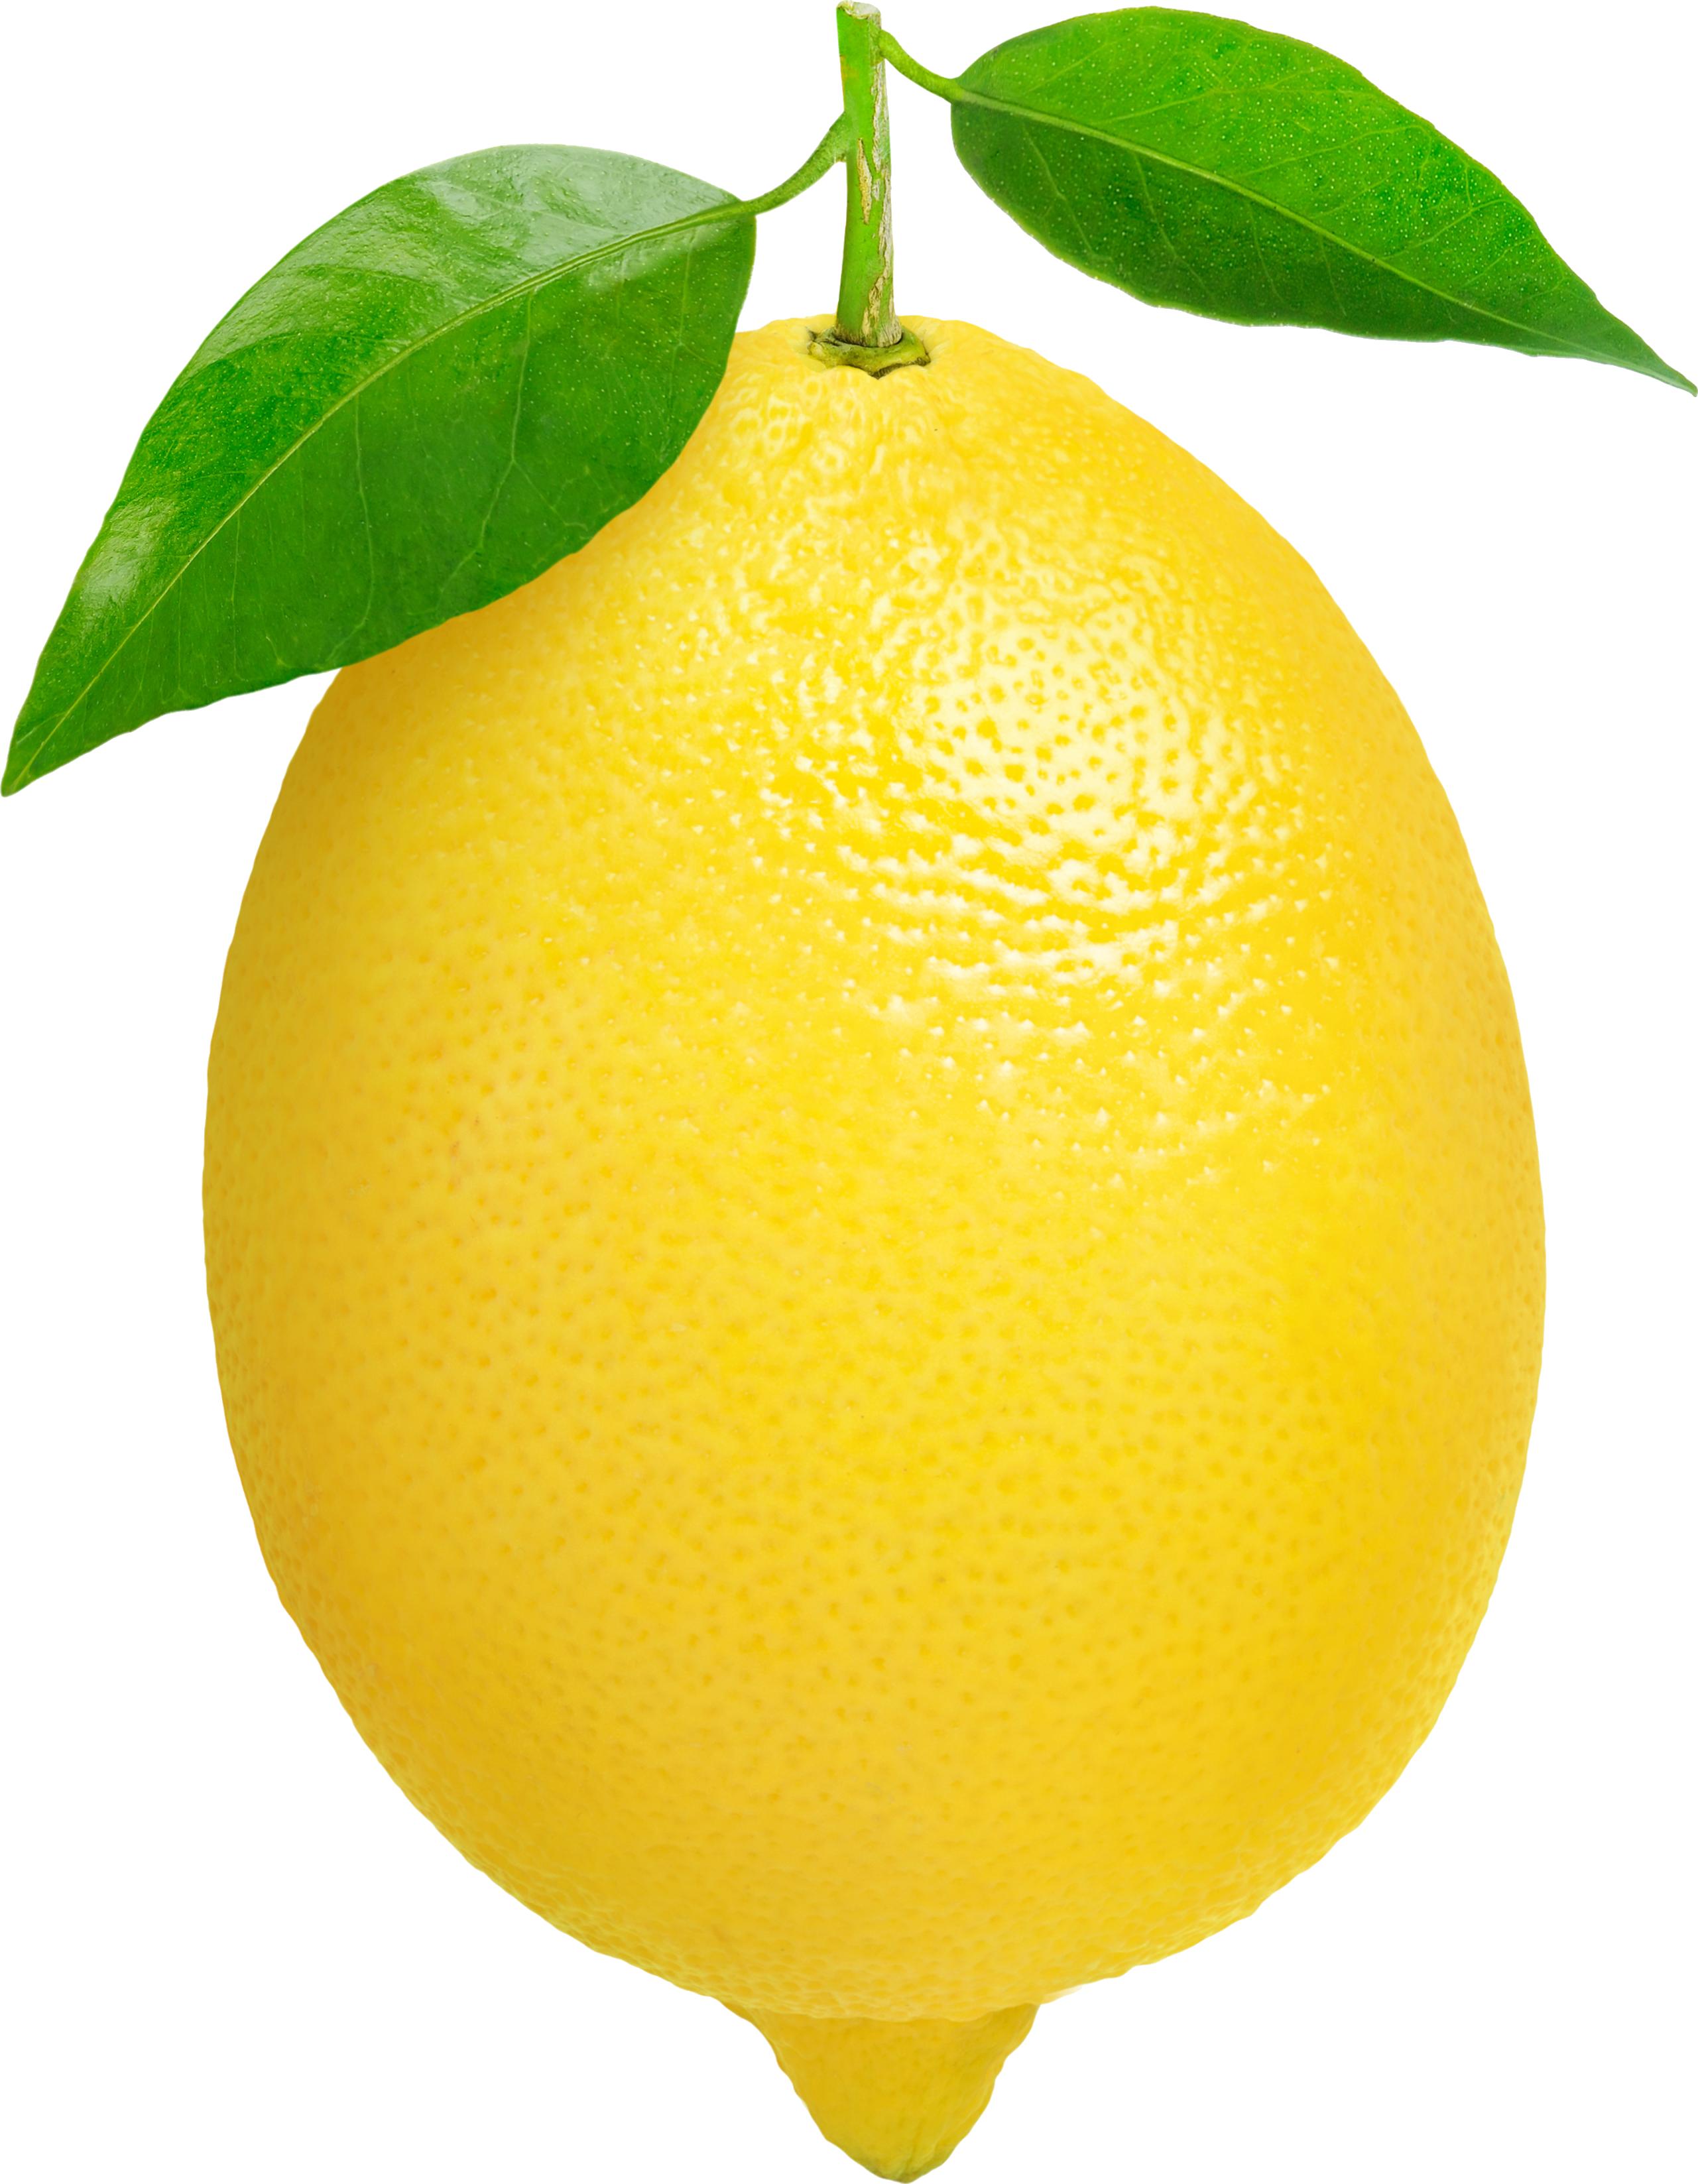 Yellow lemon clipart.